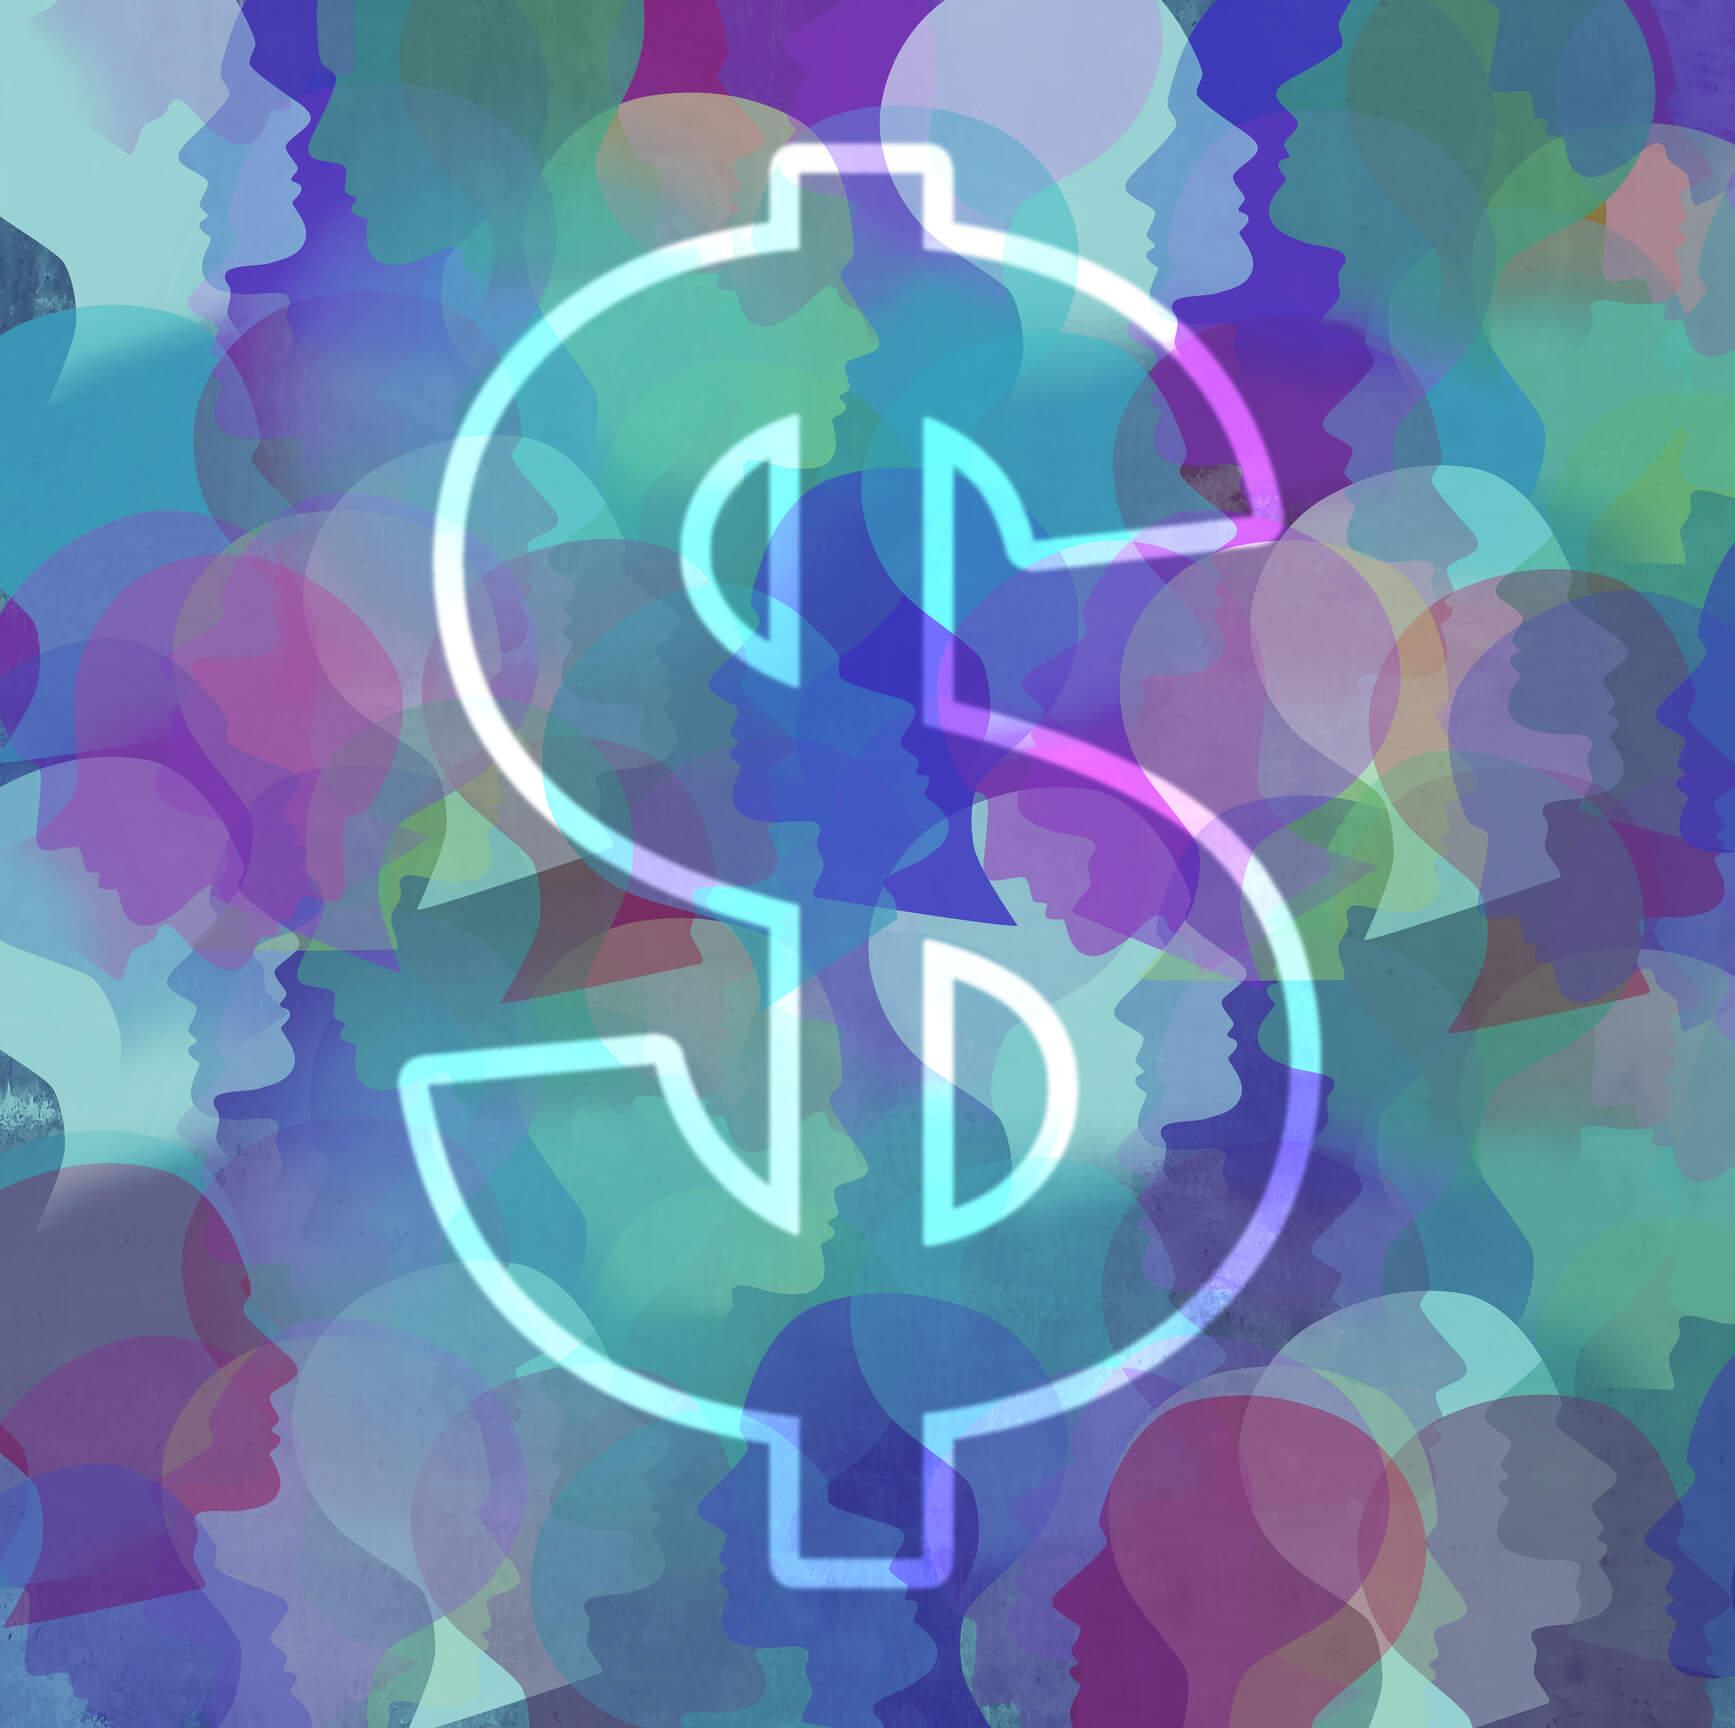 Raise Money - Complete Controller